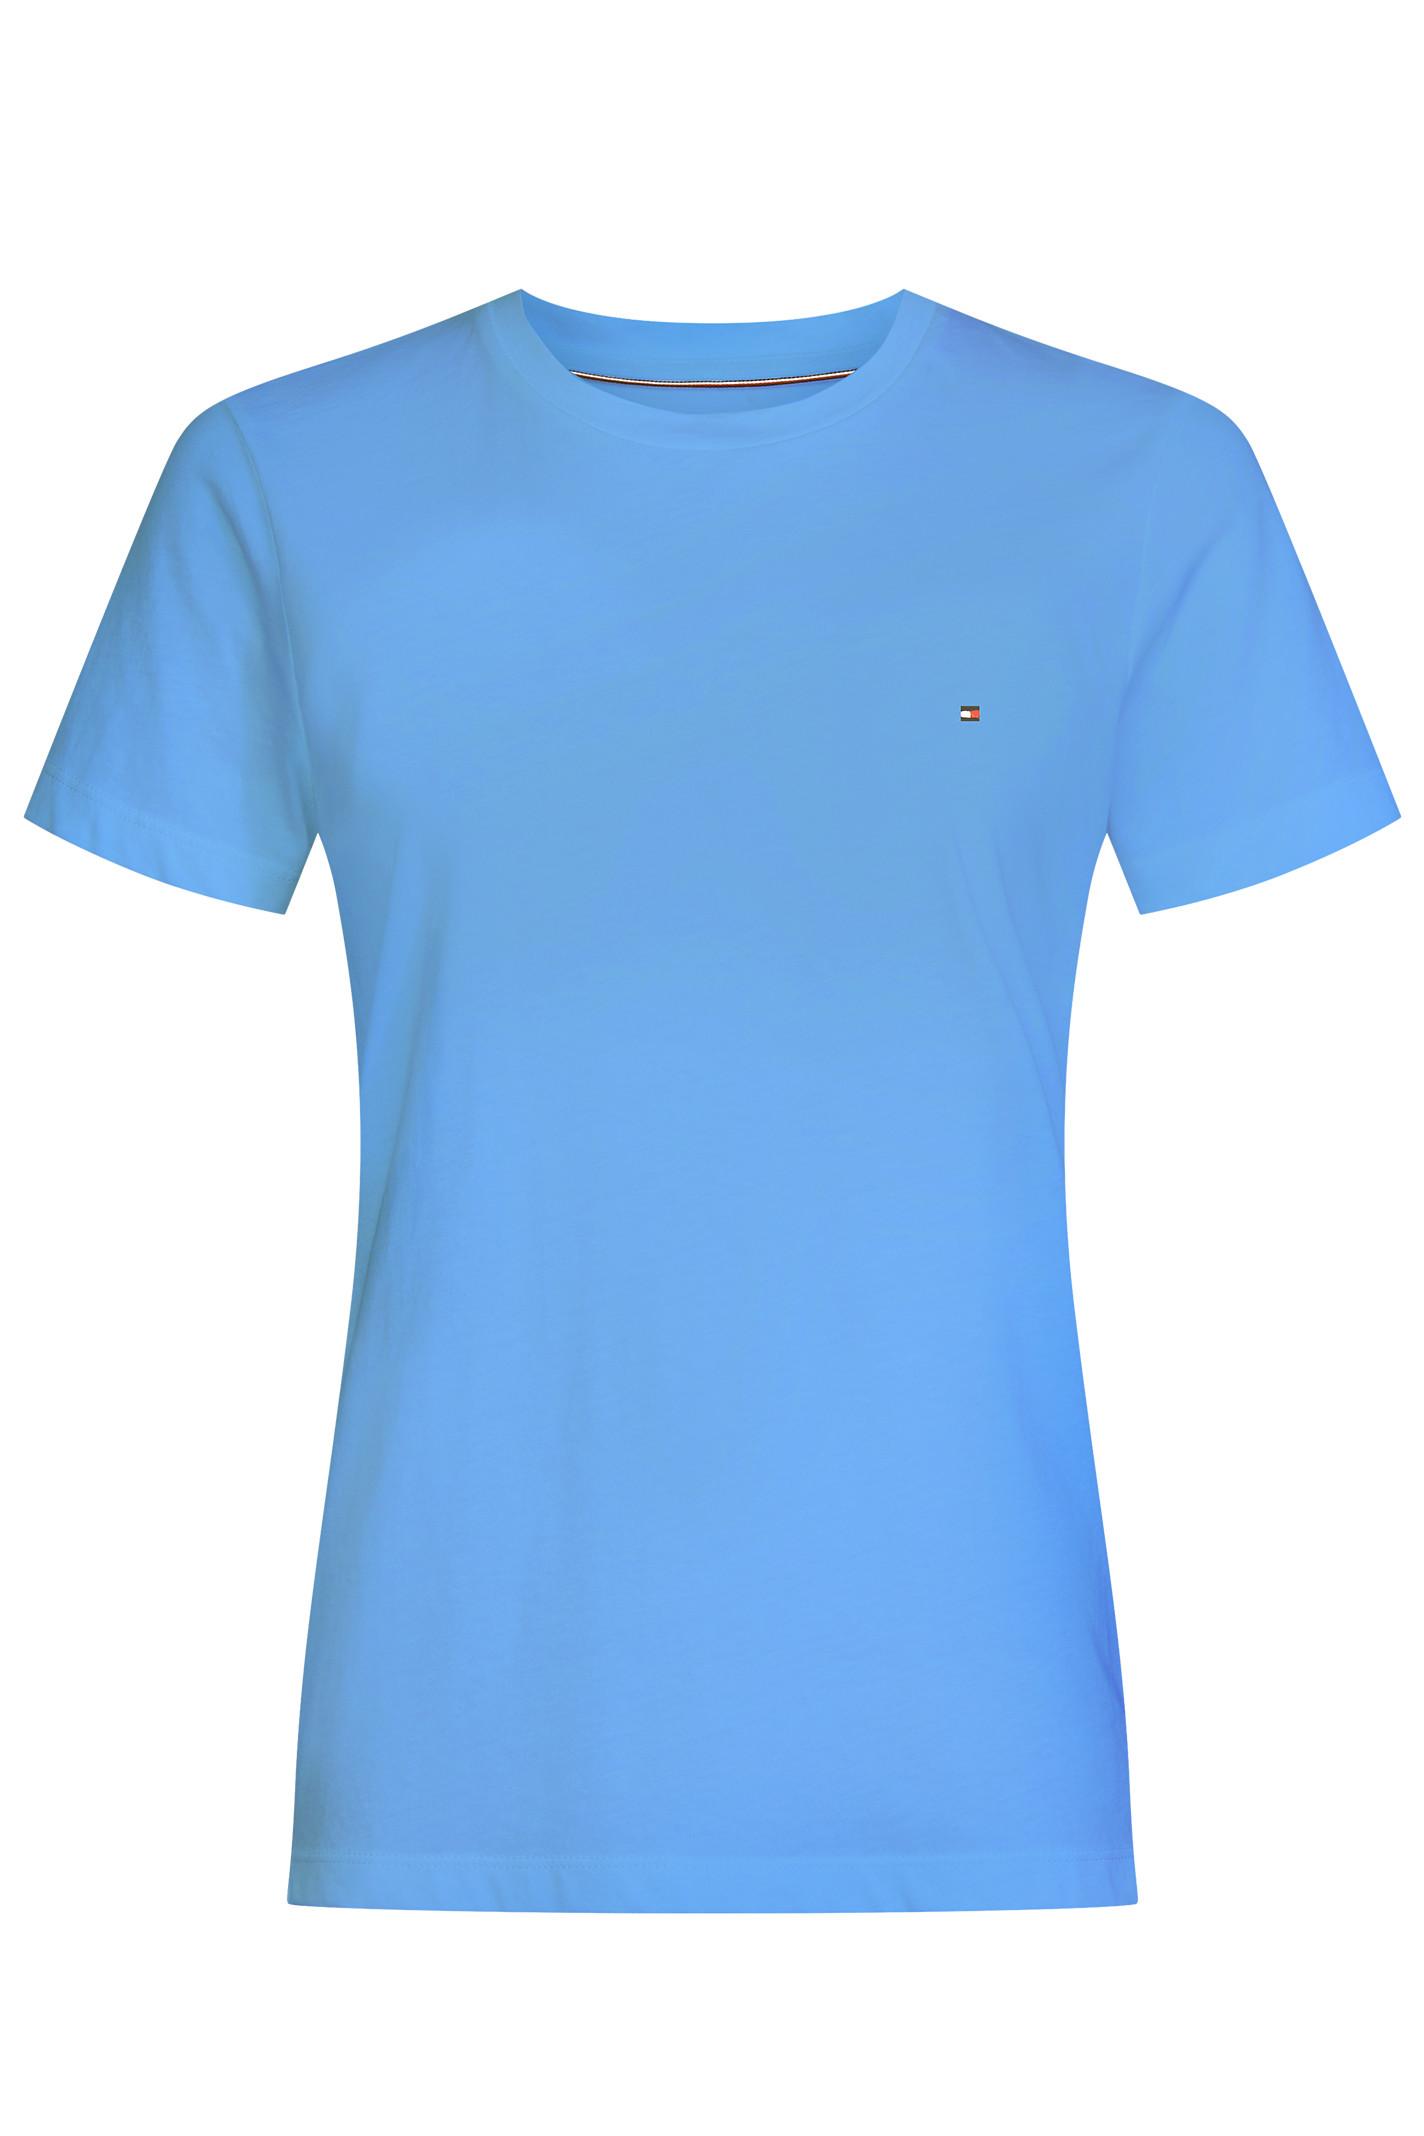 TOMMY HILFIGER NEW CREW NECK 27735 Blue